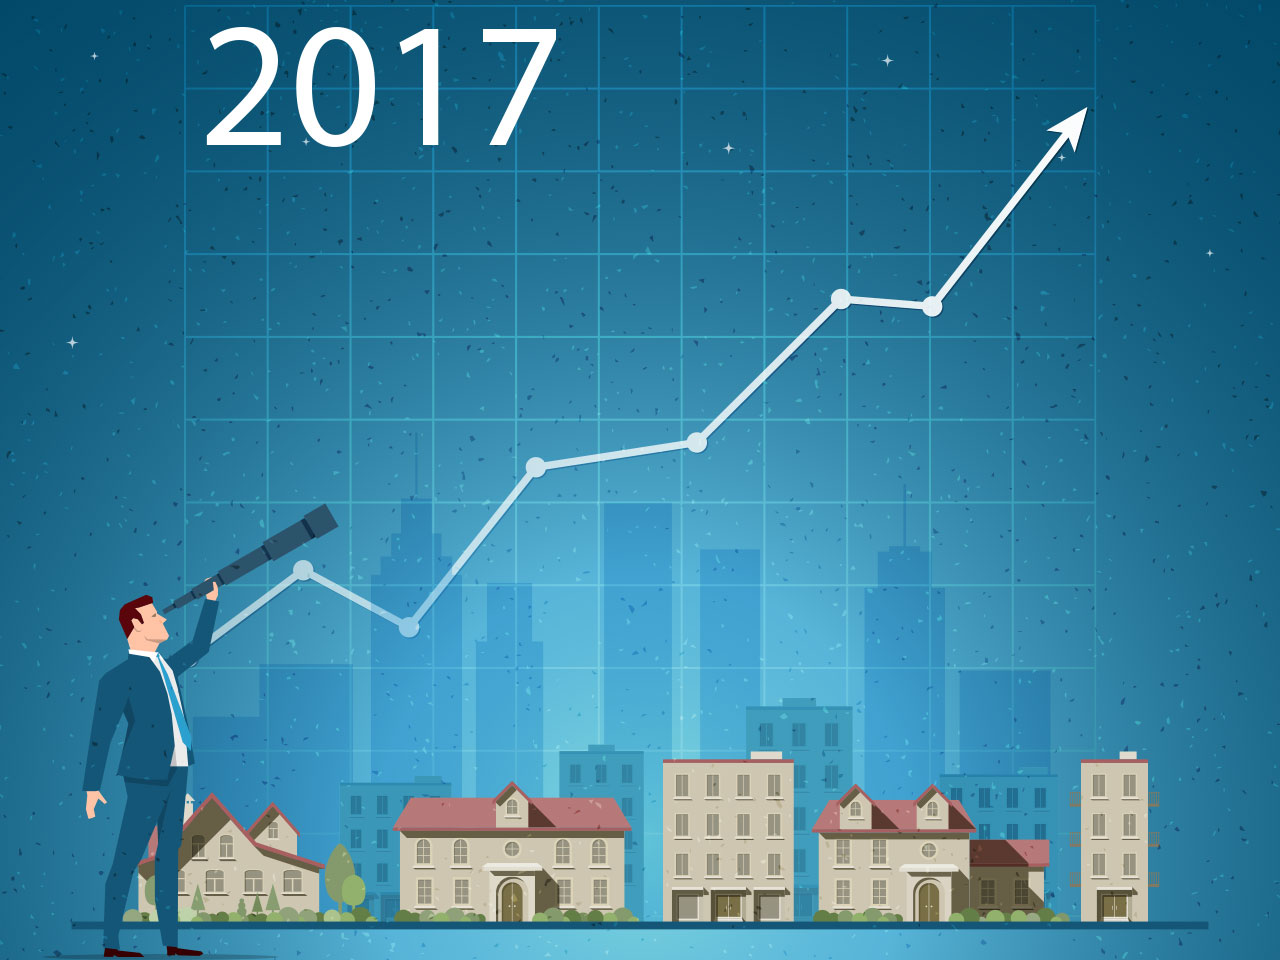 L'investissement immobilier reste attractif